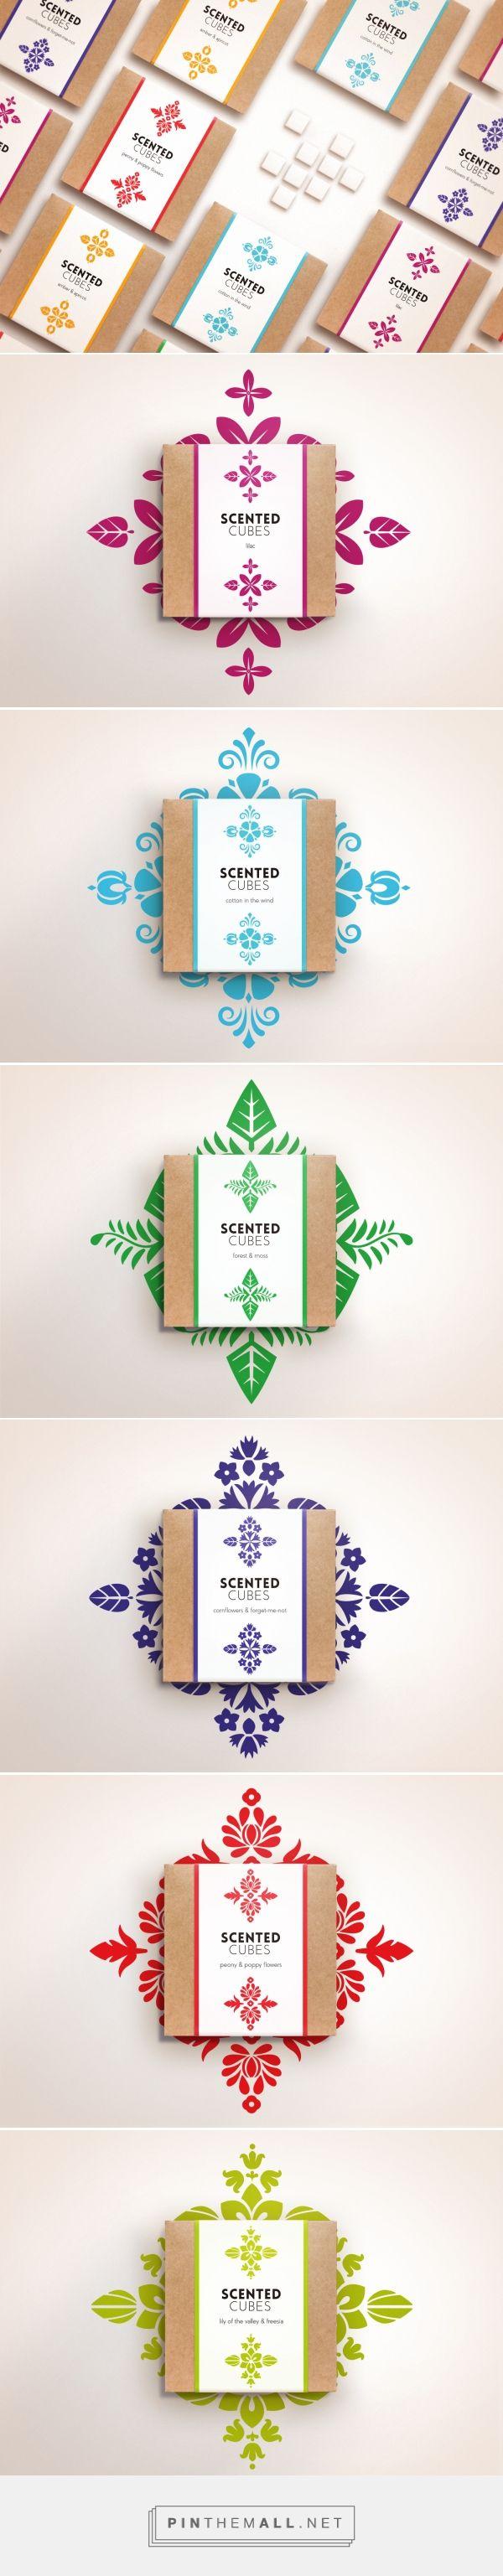 Scented Cubes by Joanna Szekalska. Source: Behance. Packaging design